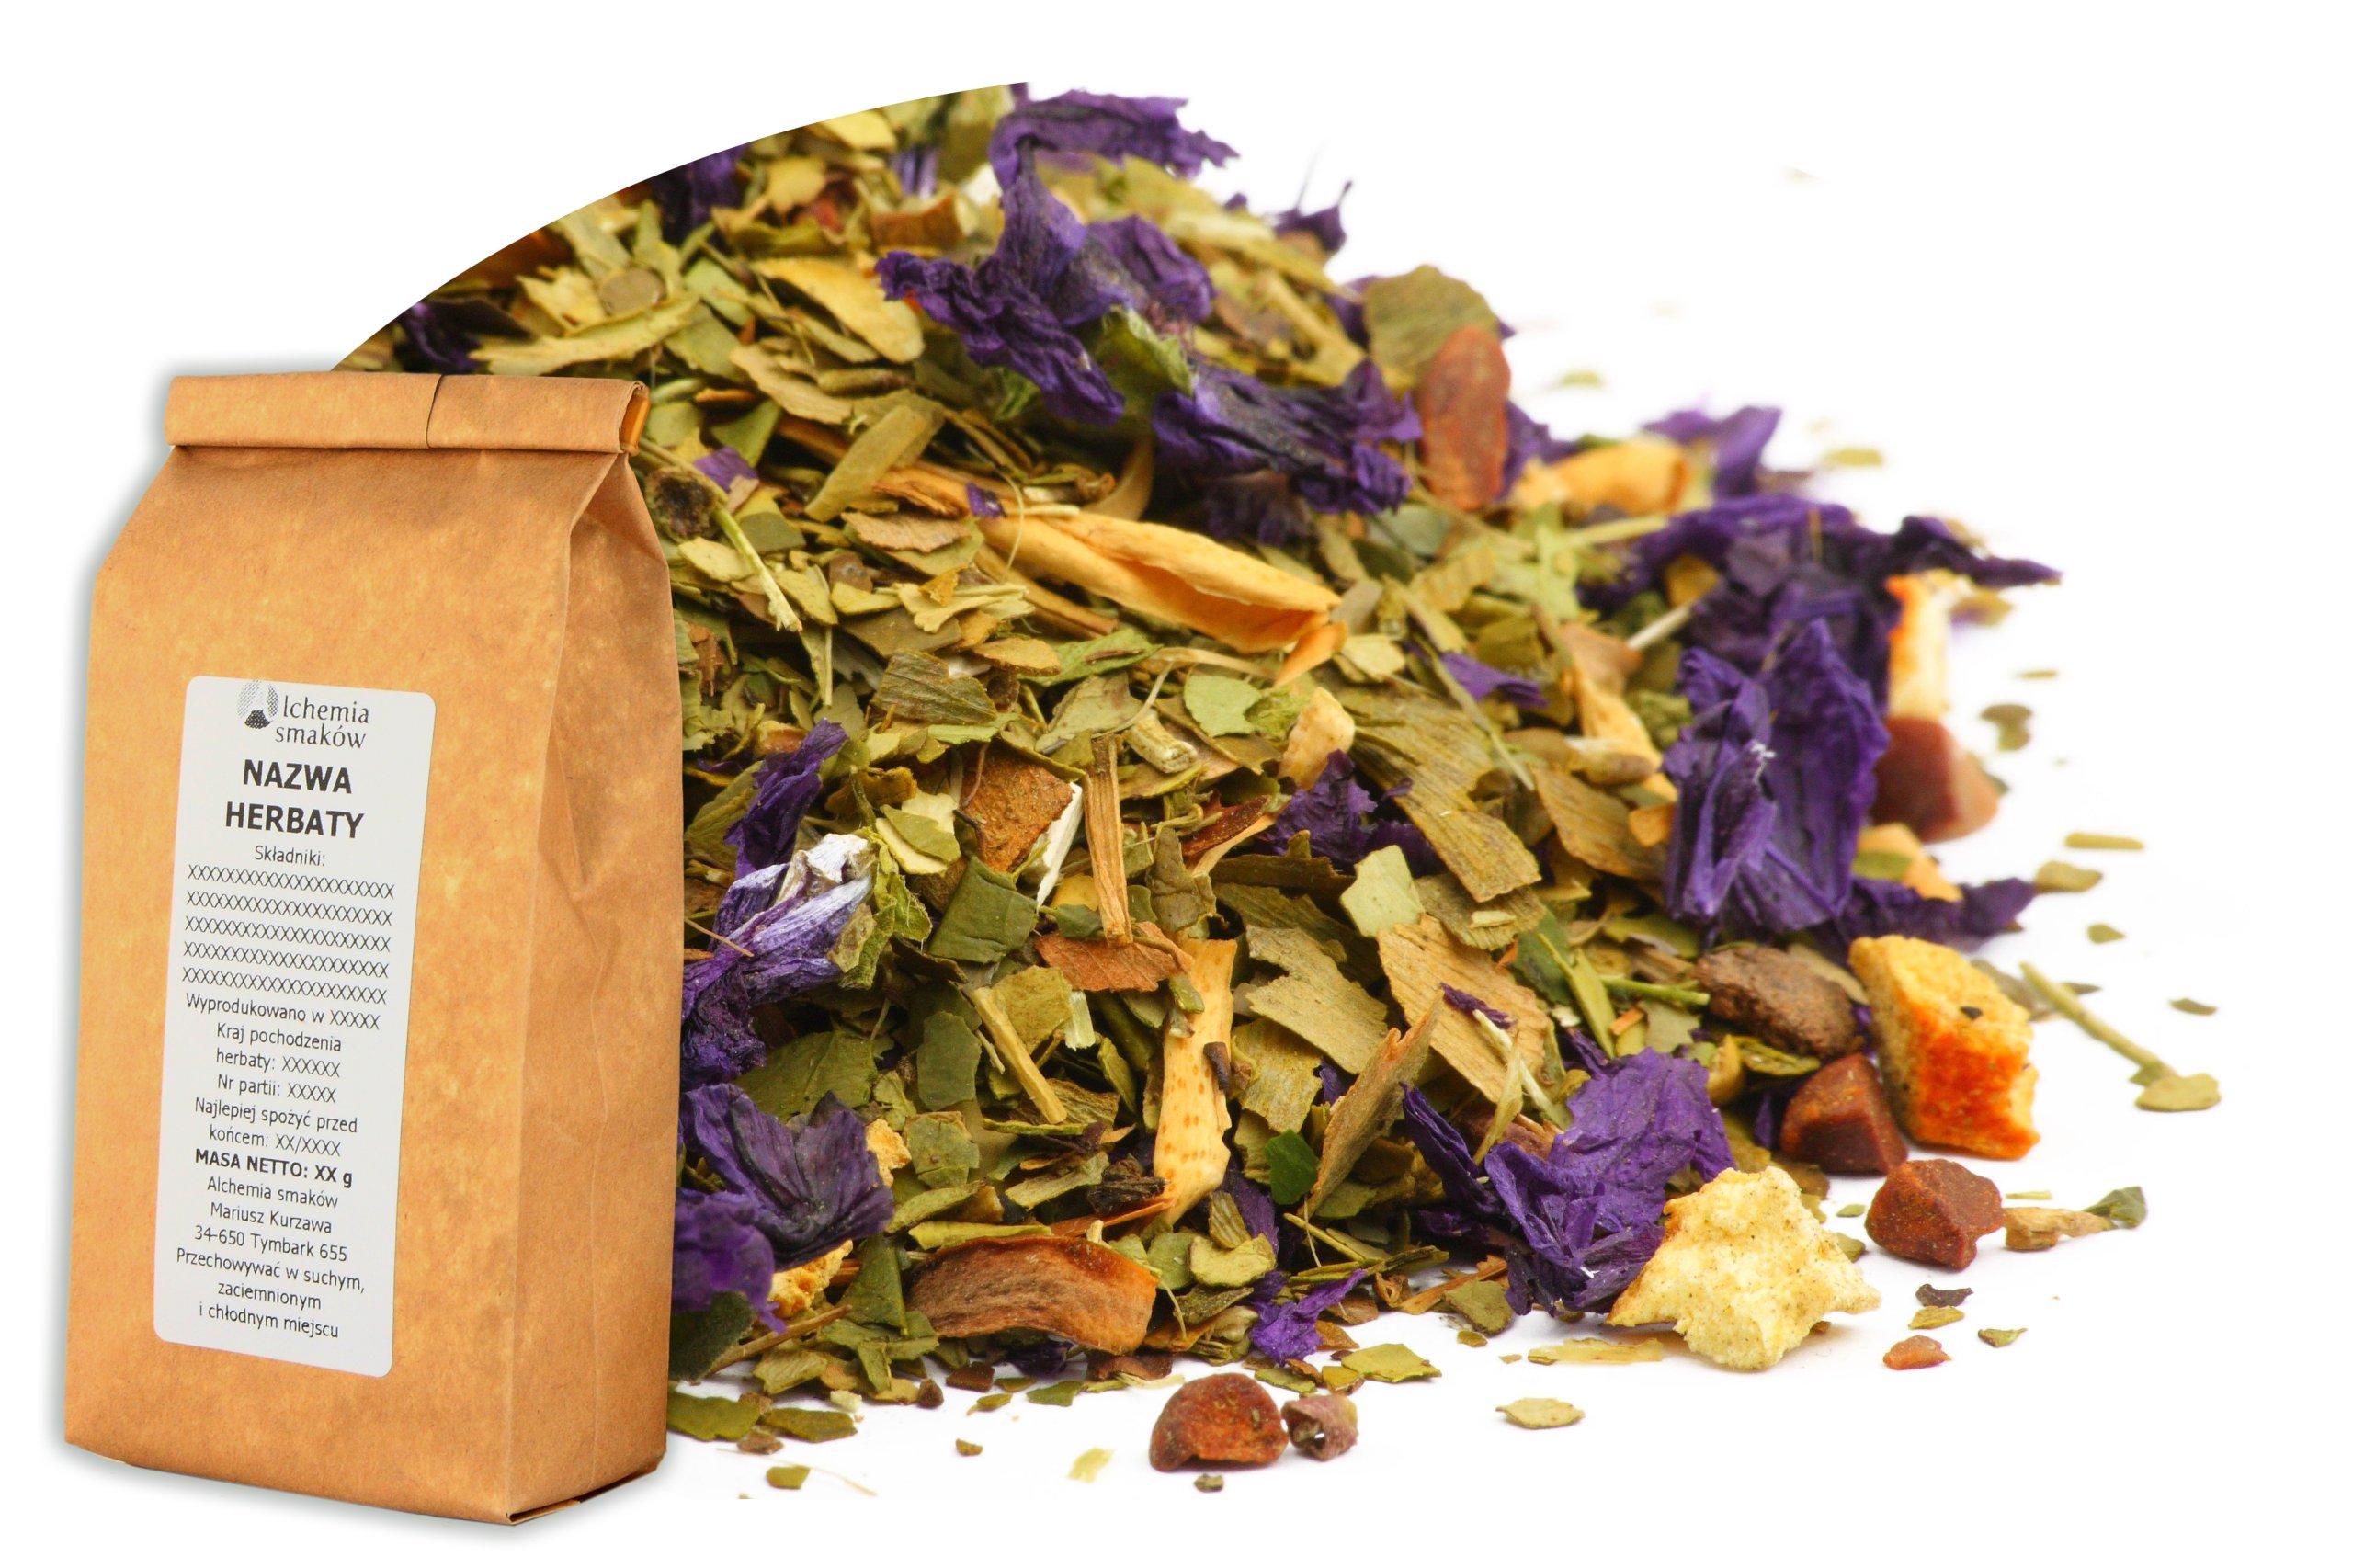 Yerba mate – prezent dla zwolenników herbat?